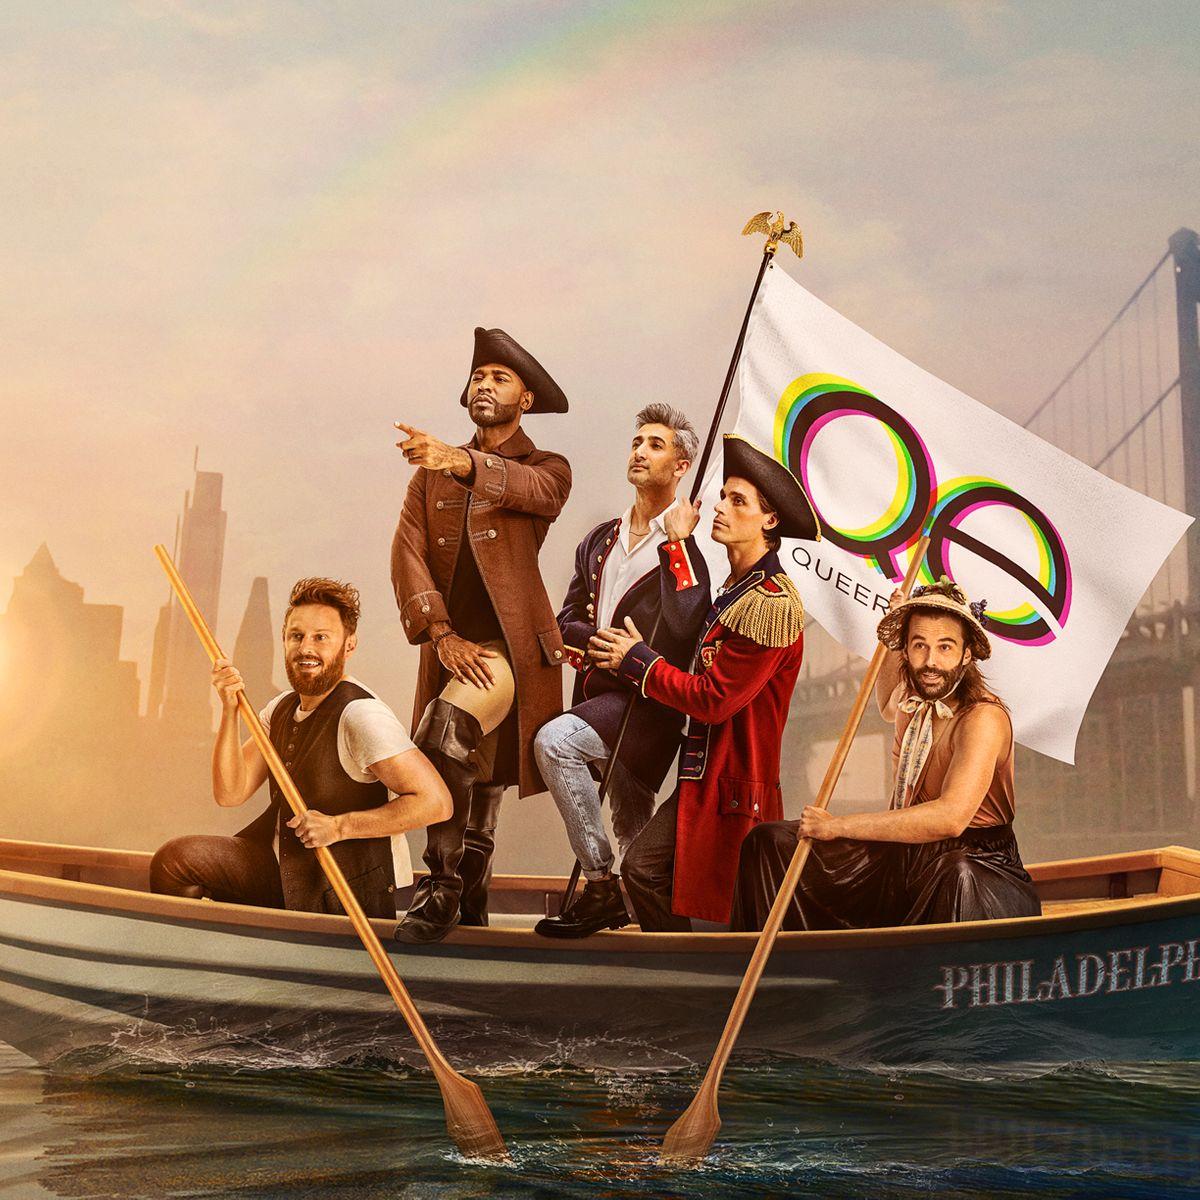 Netflix's Queer Eye Season 5 Set in Philadelphia